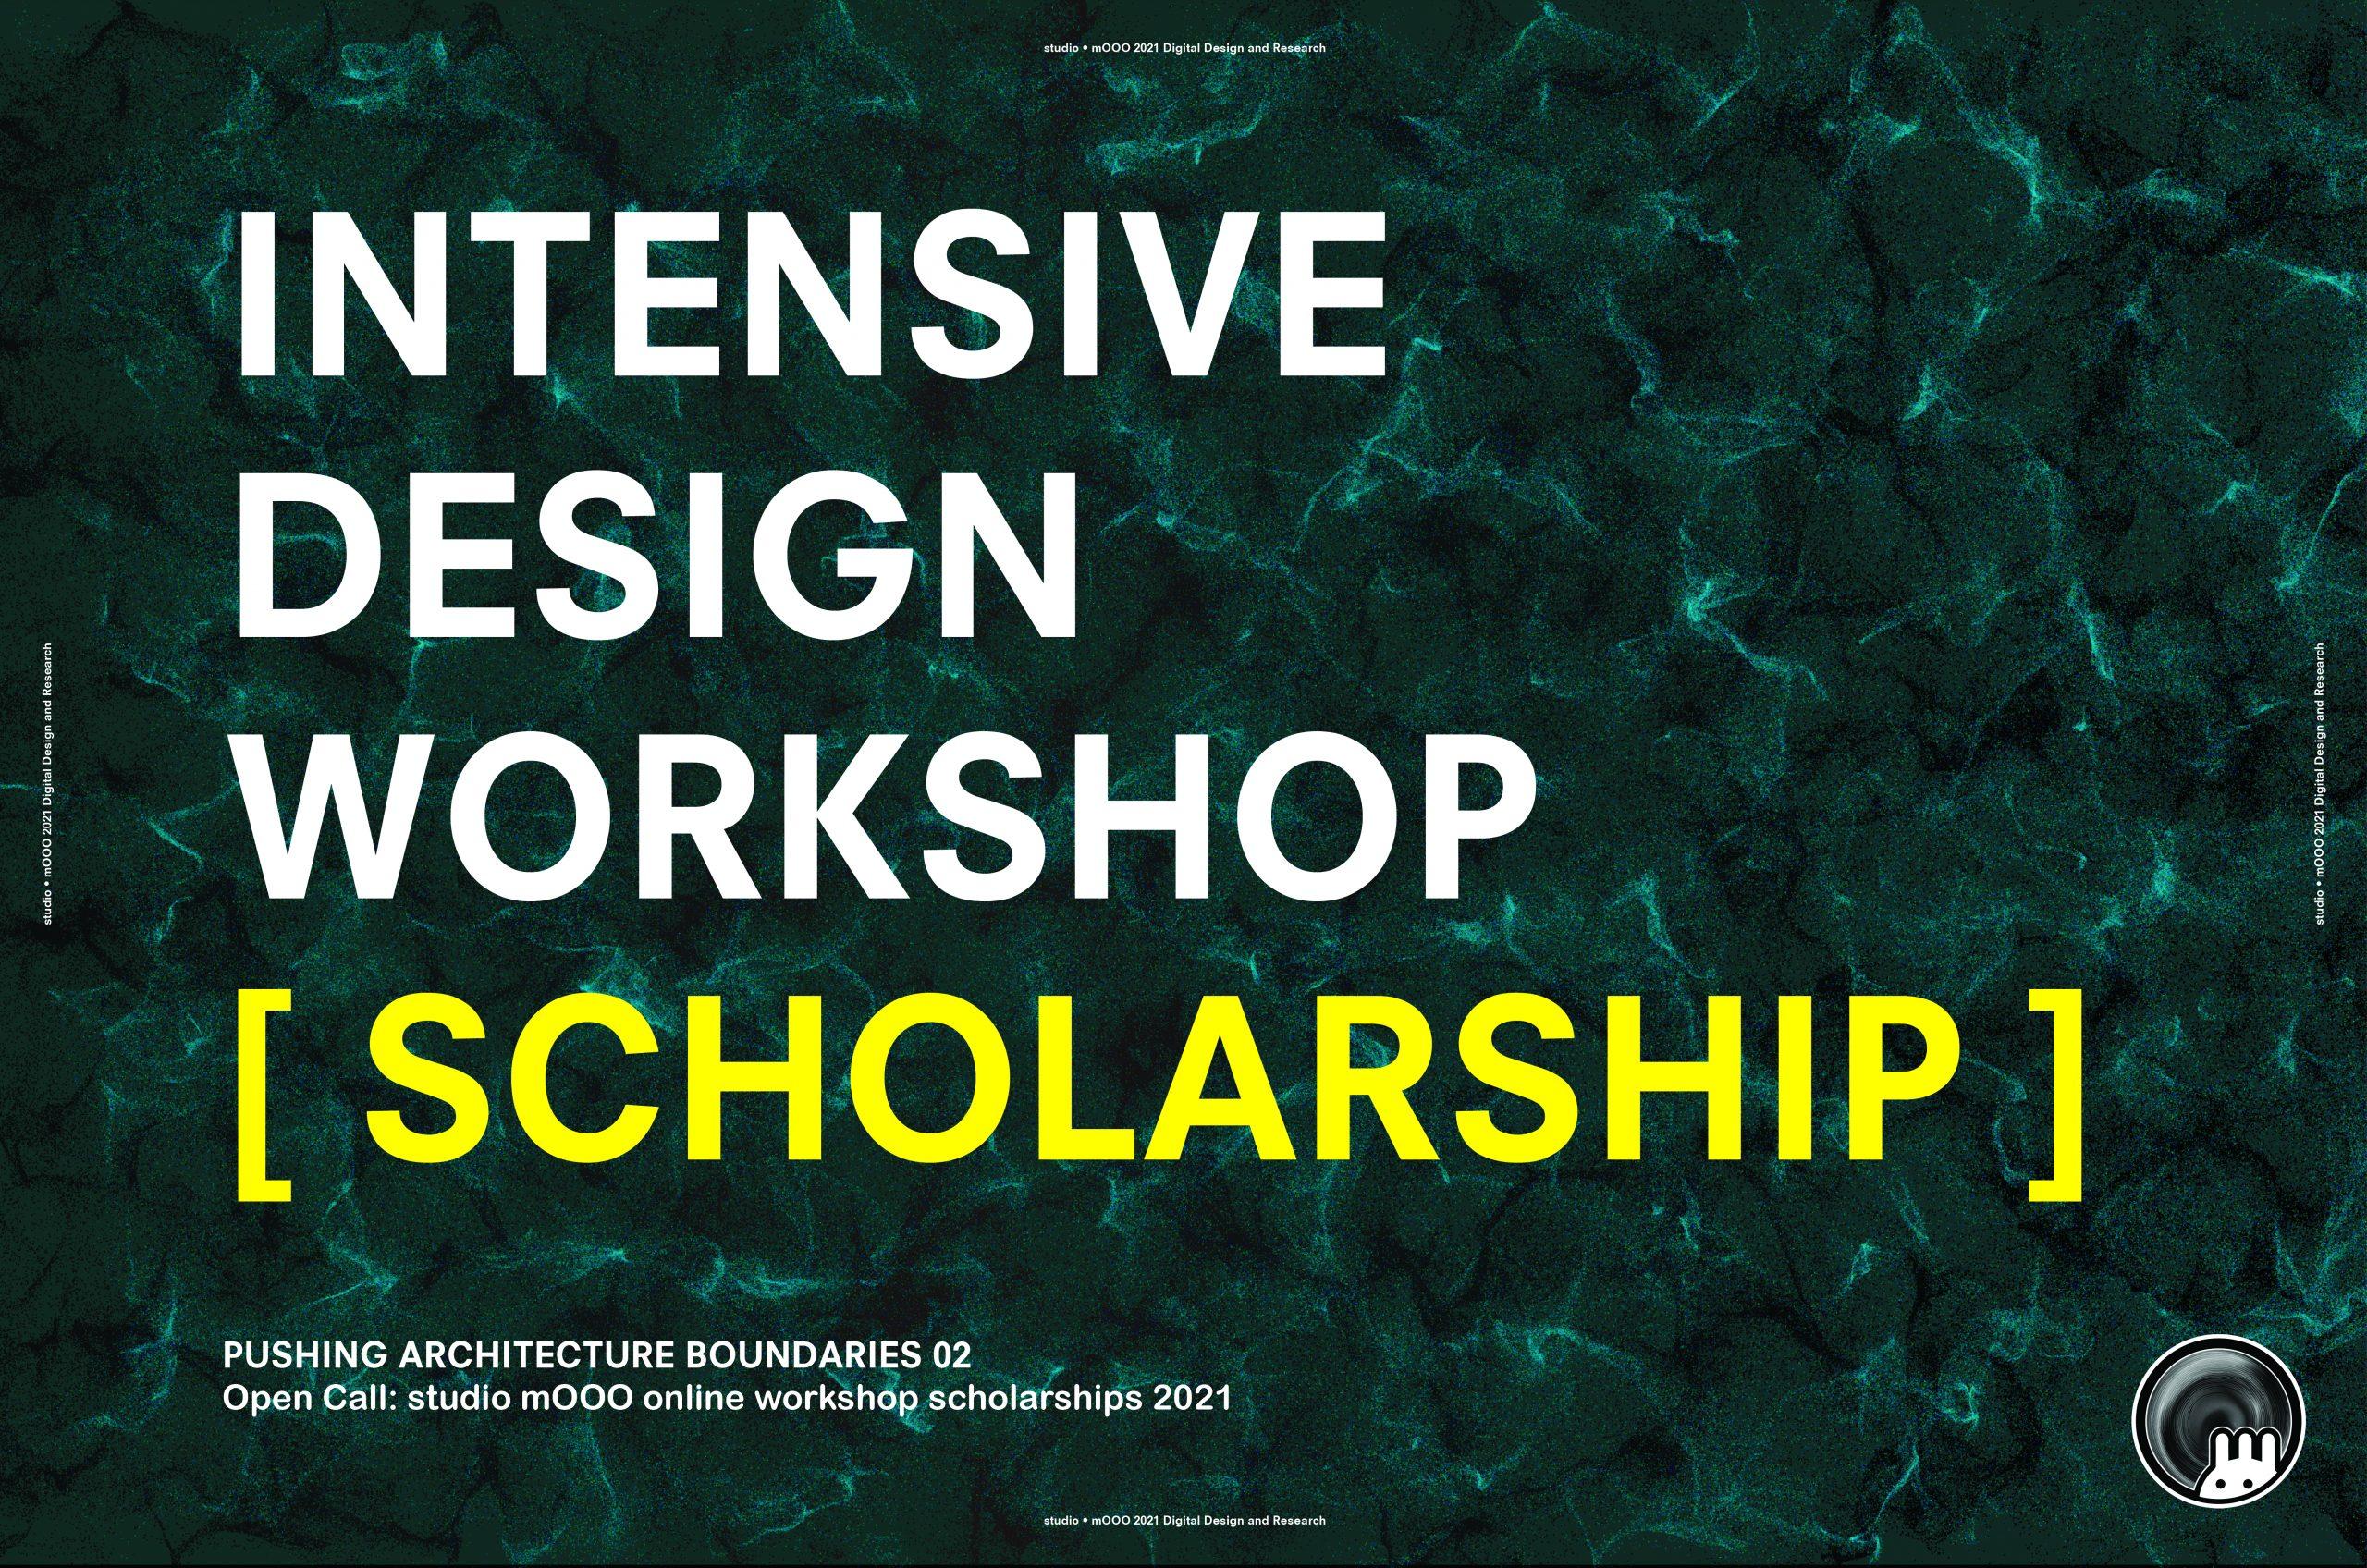 mOOO-architecture-intensive-design-workshop-scholarship